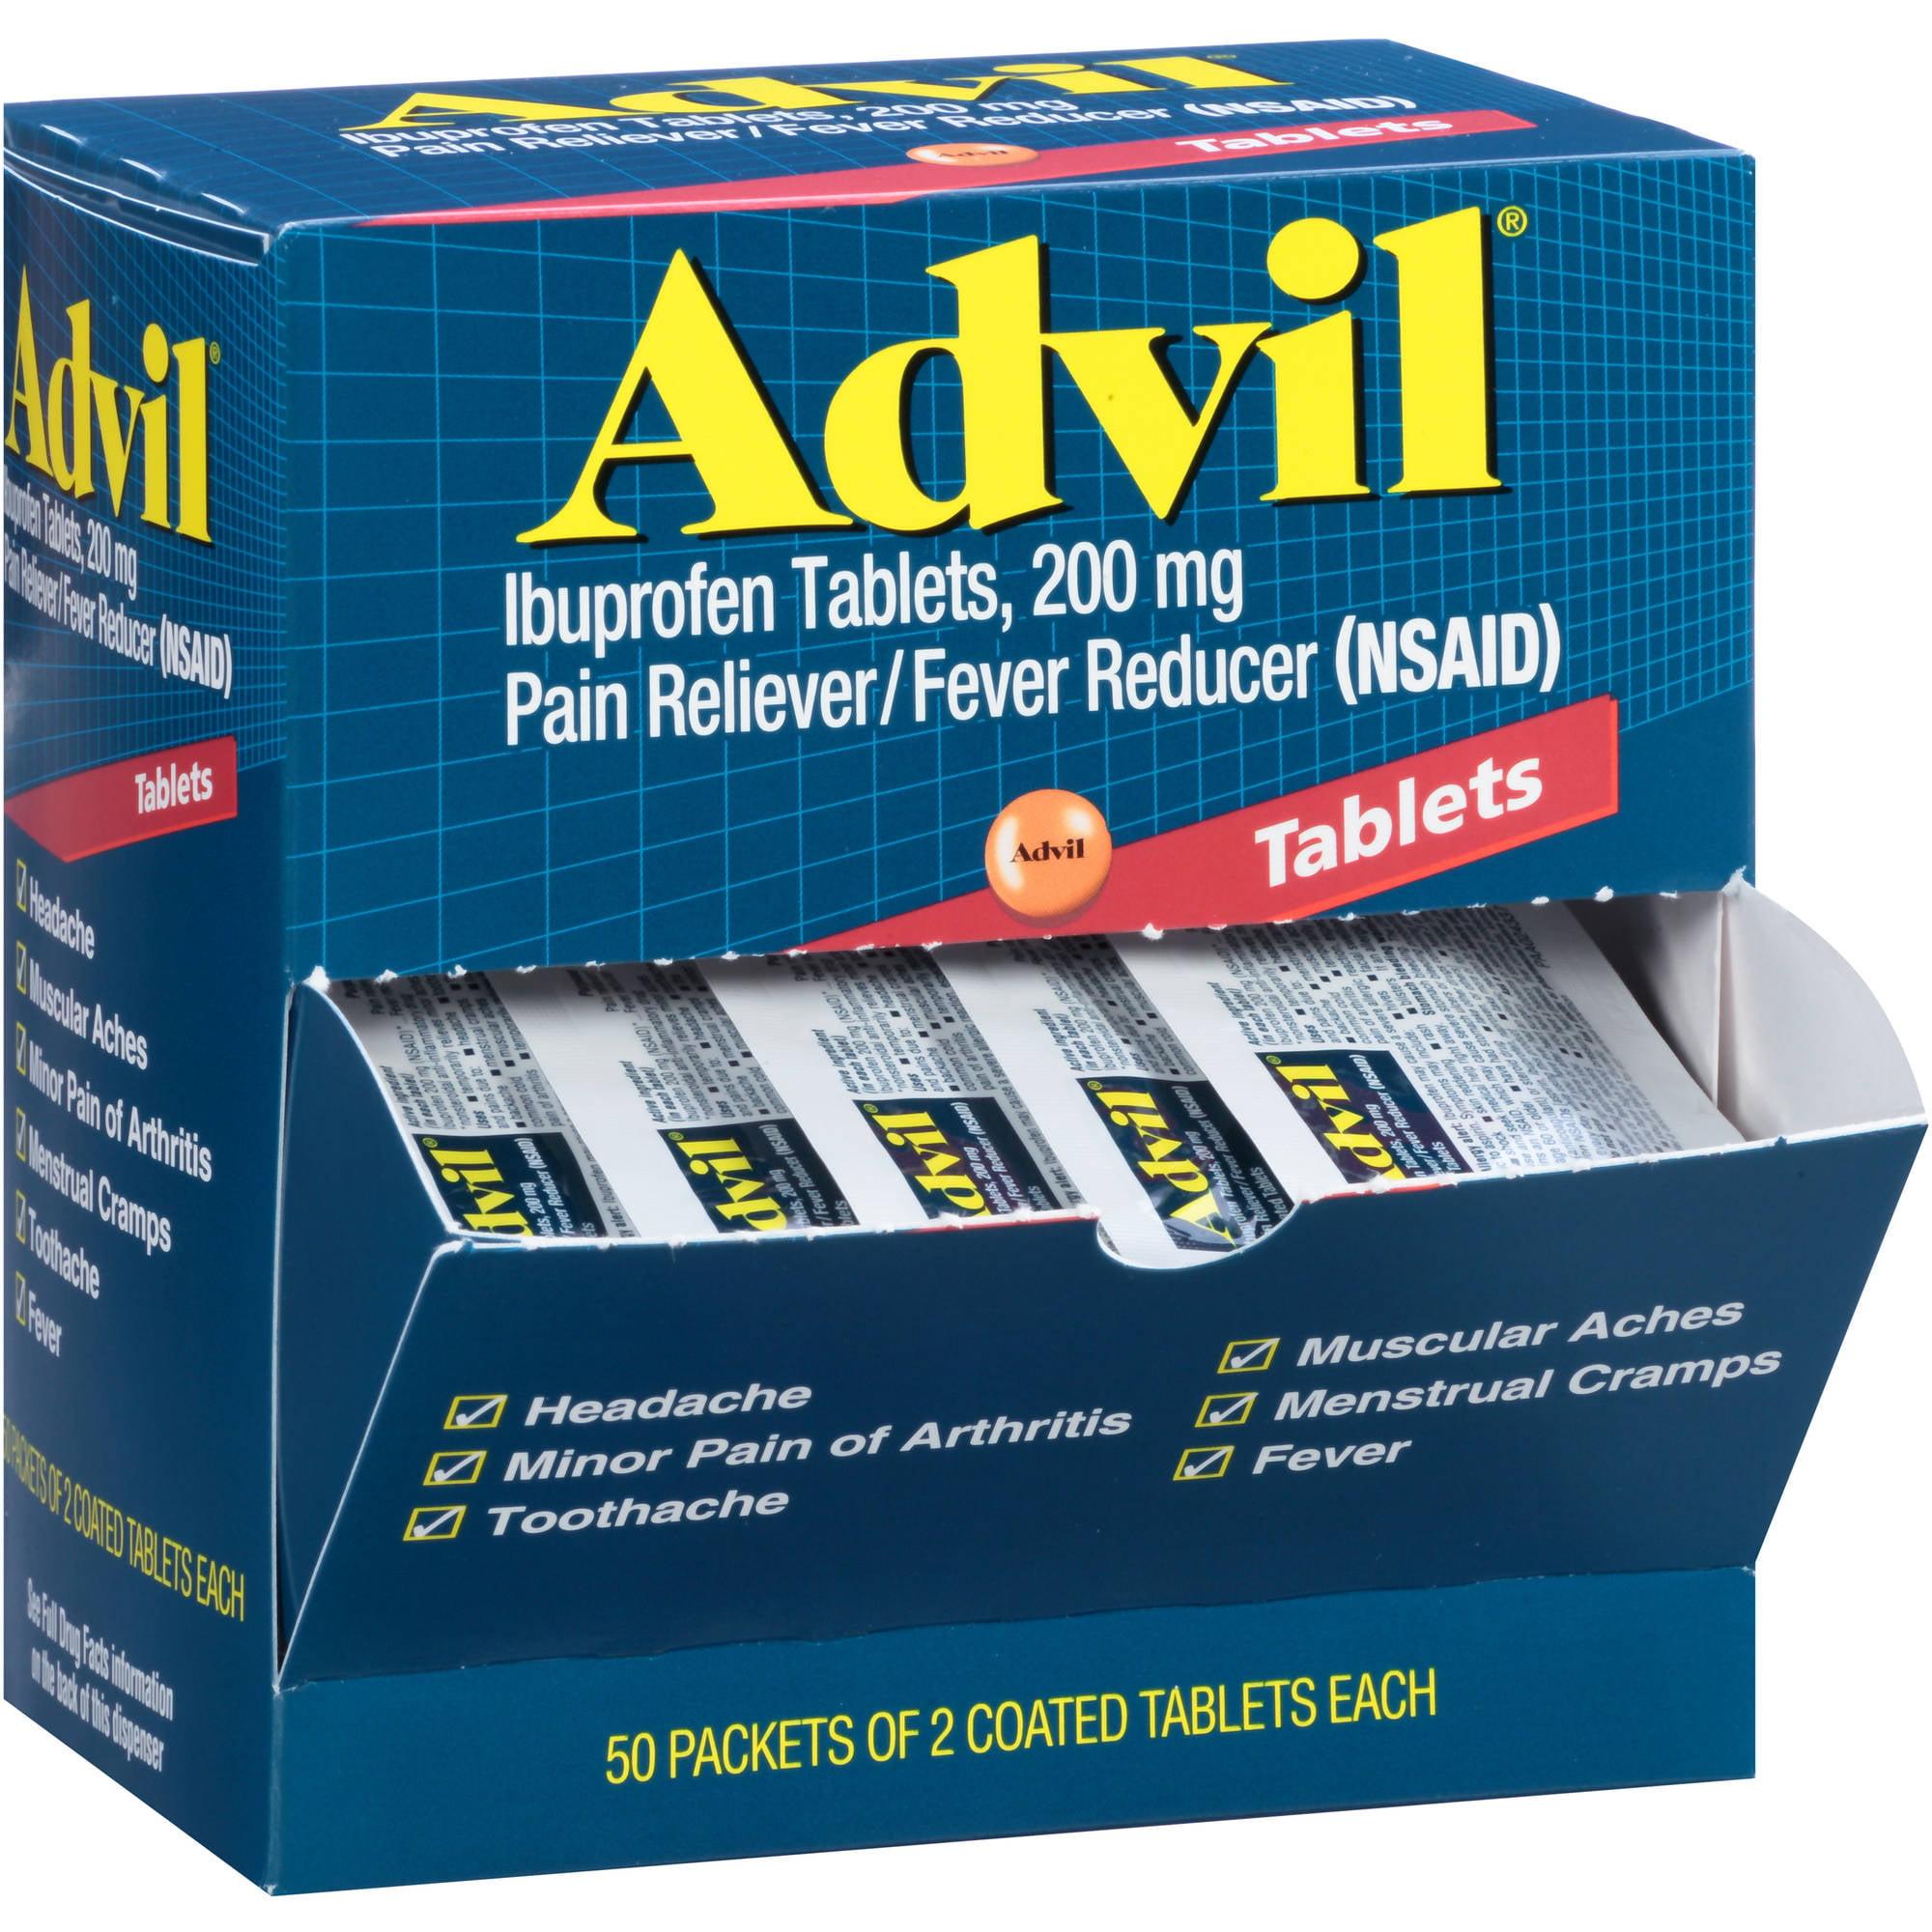 Advil Pain Reliever / Fever Reducer (Ibuprofen) Tablet Dispenser 2 count